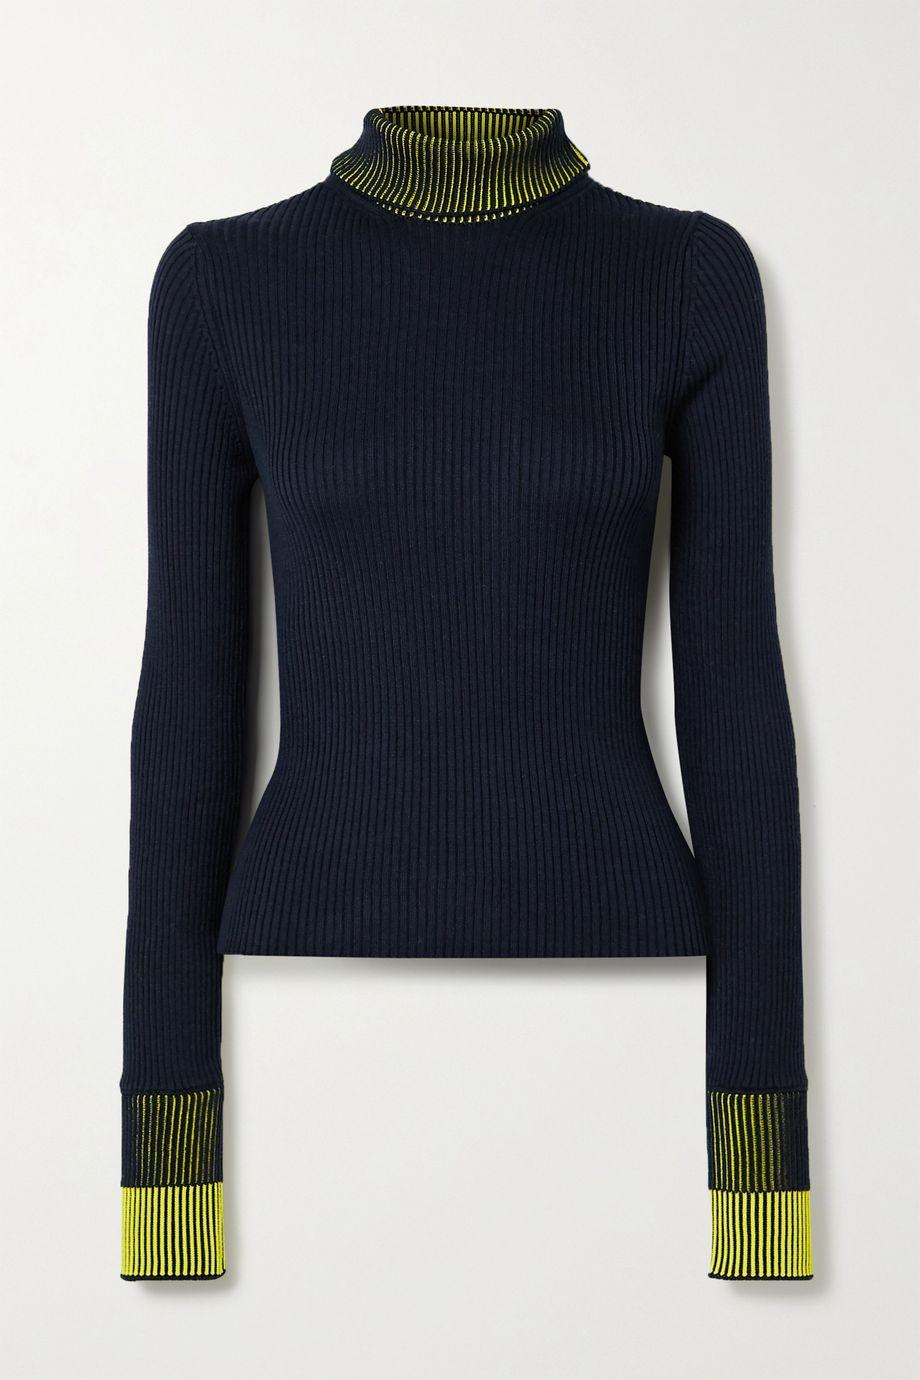 Maison Margiela Ribbed cotton-blend turtleneck sweater